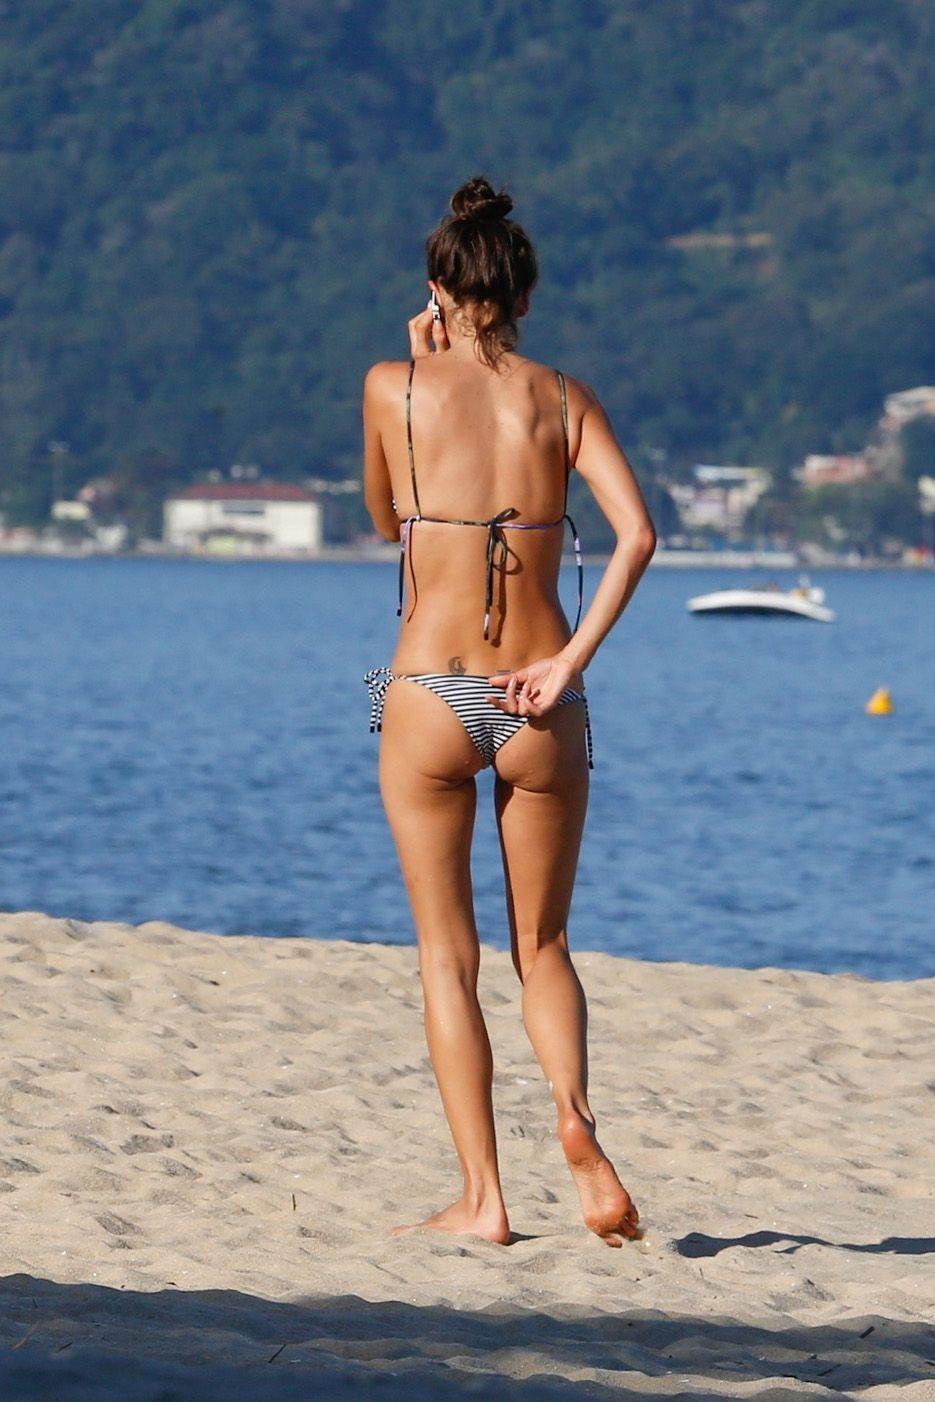 Alessandra ambrosio nude sex scene in verdades secretas - 2 part 3